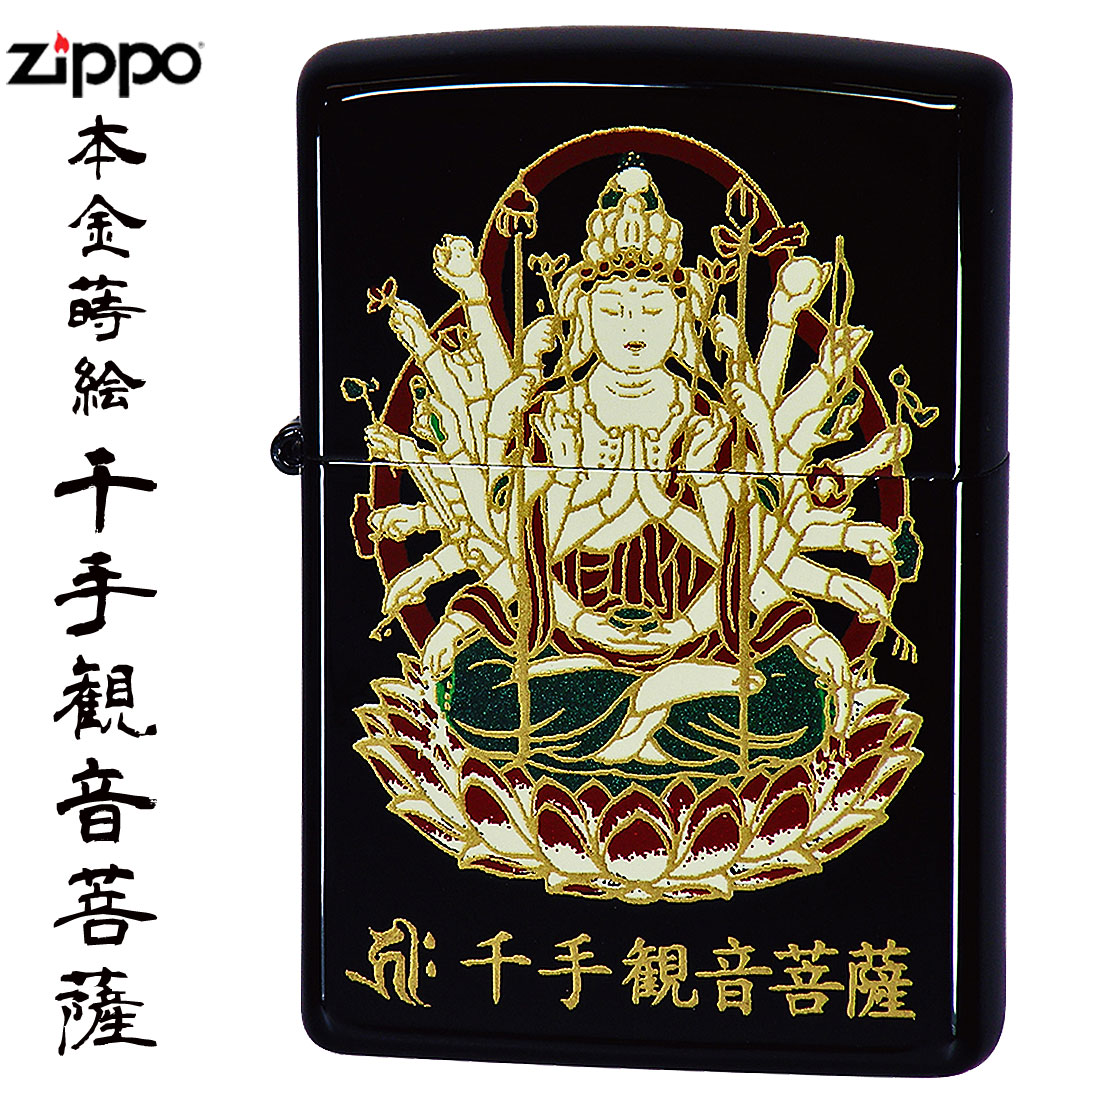 zippo (ジッポーライター)本金蒔絵    千手観音菩薩 漆塗 仏像シリーズ 画像